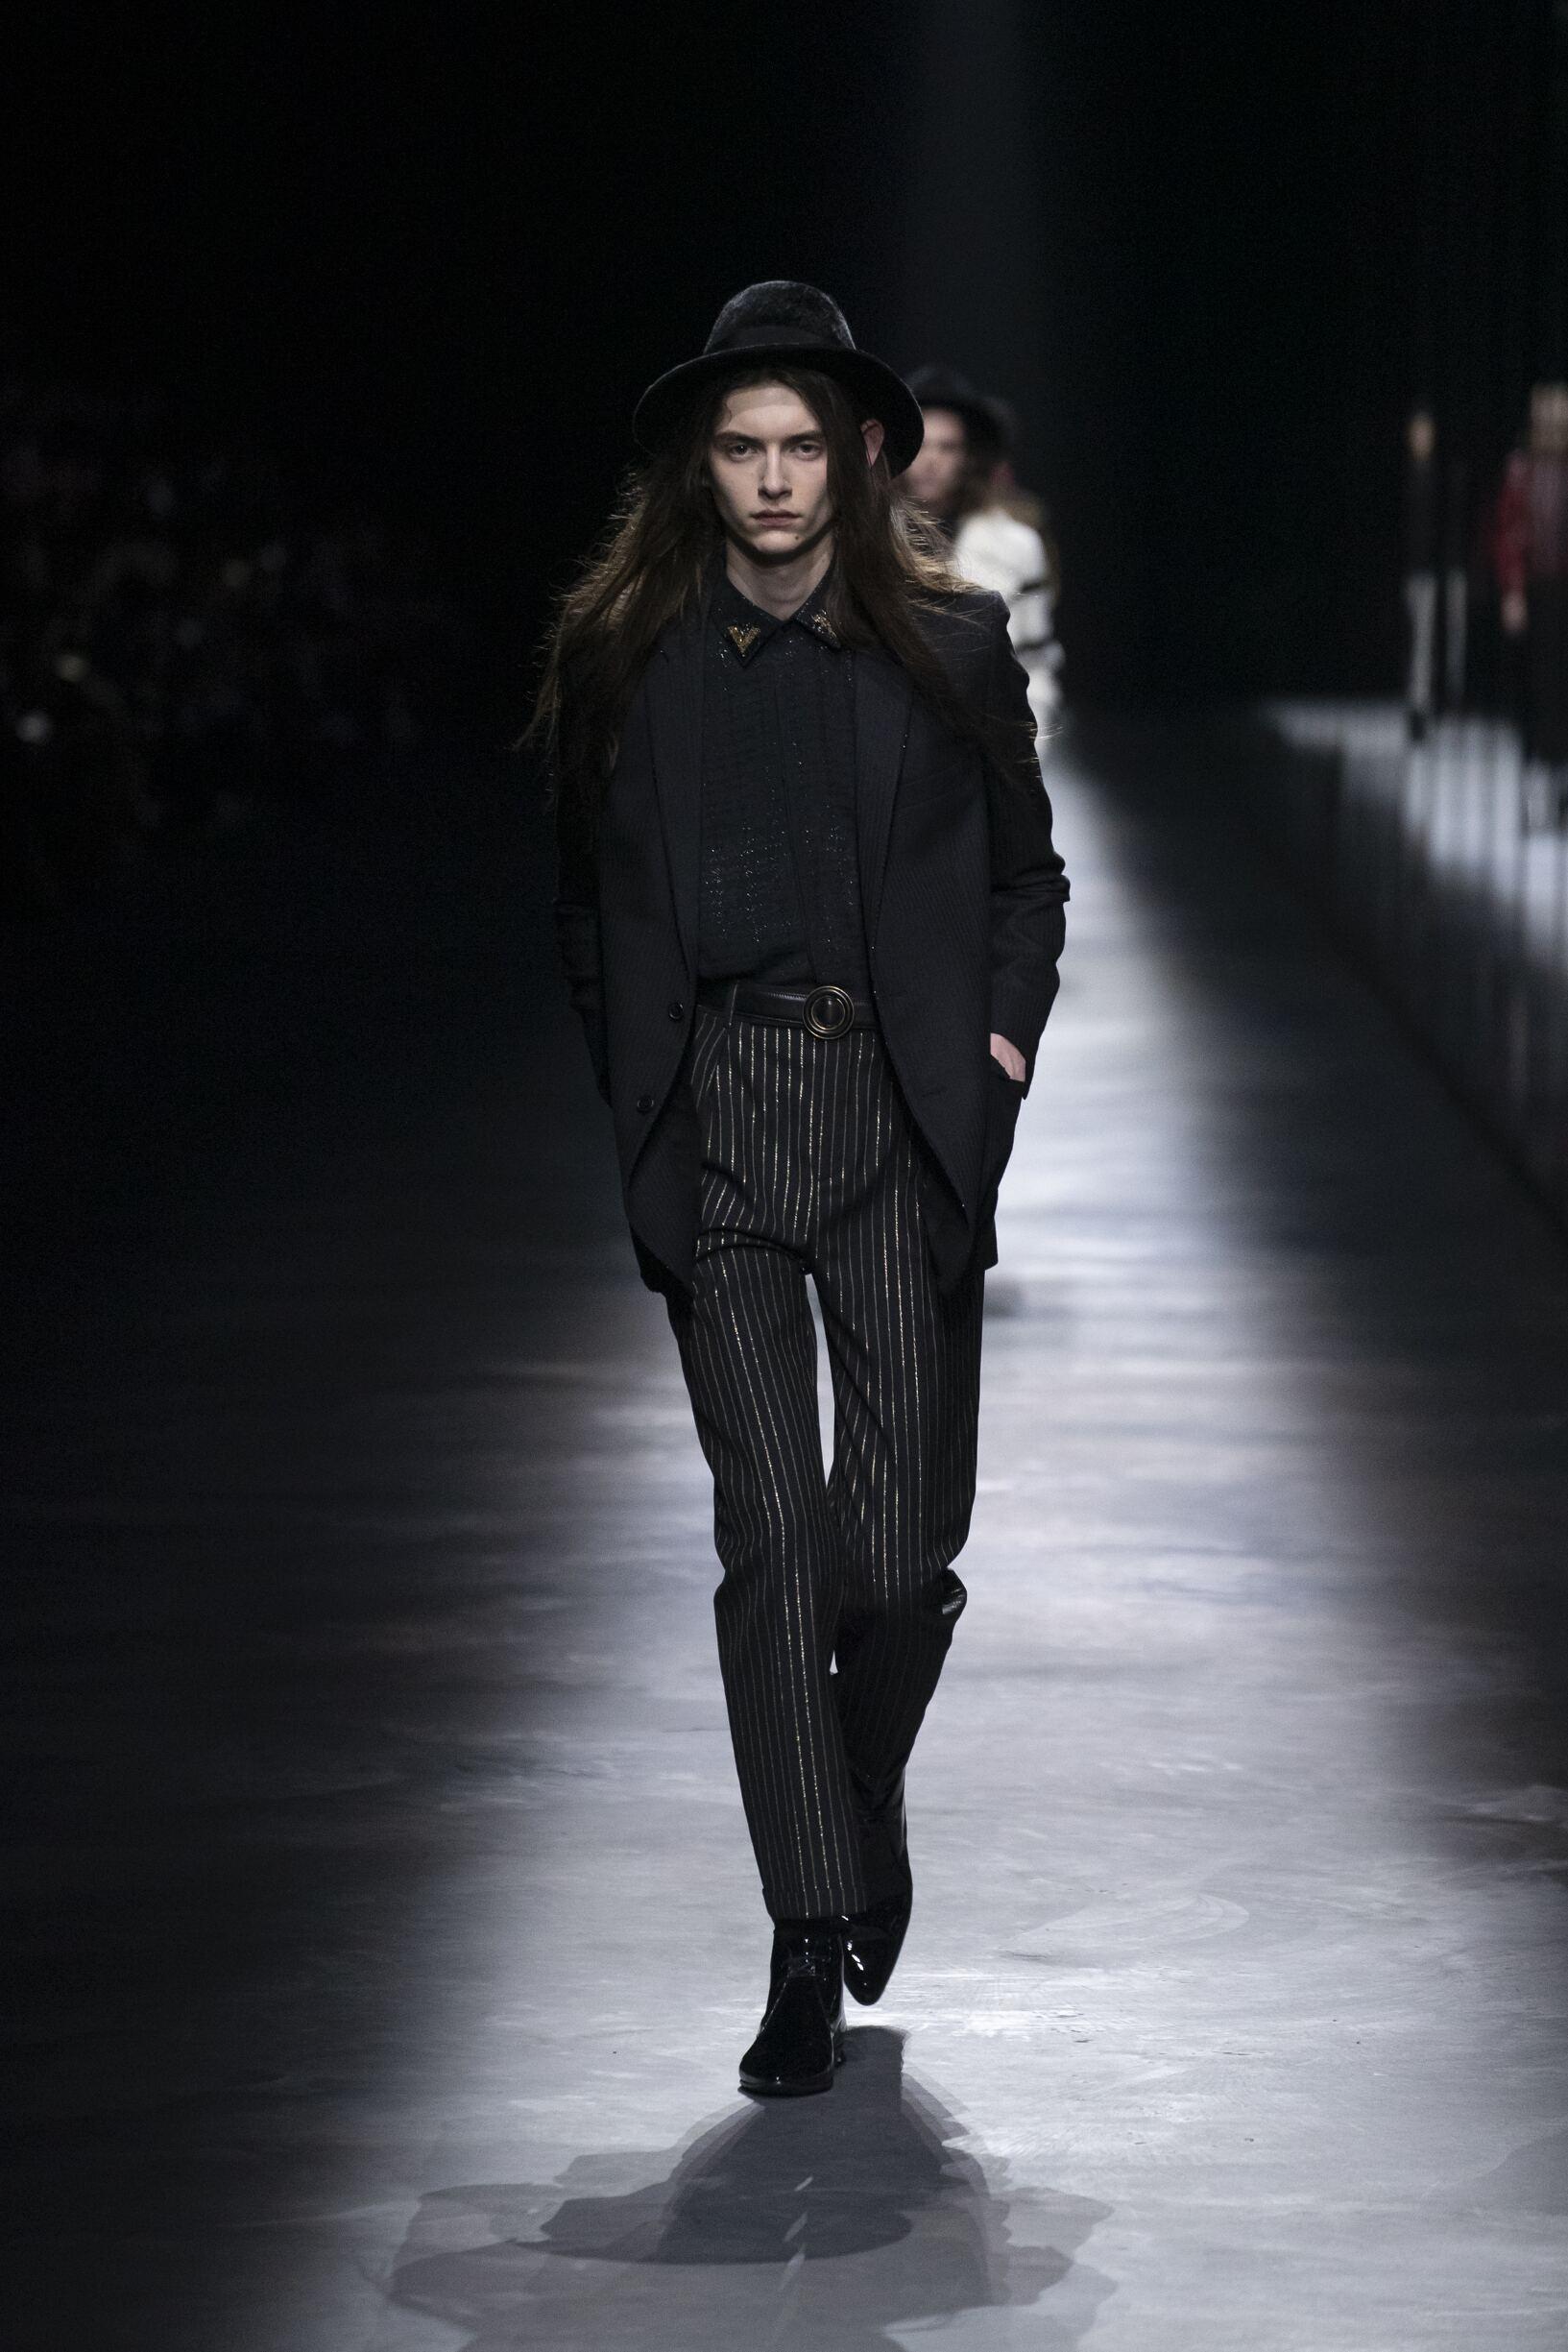 Man Fashion 2019 Runway Saint Laurent Winter